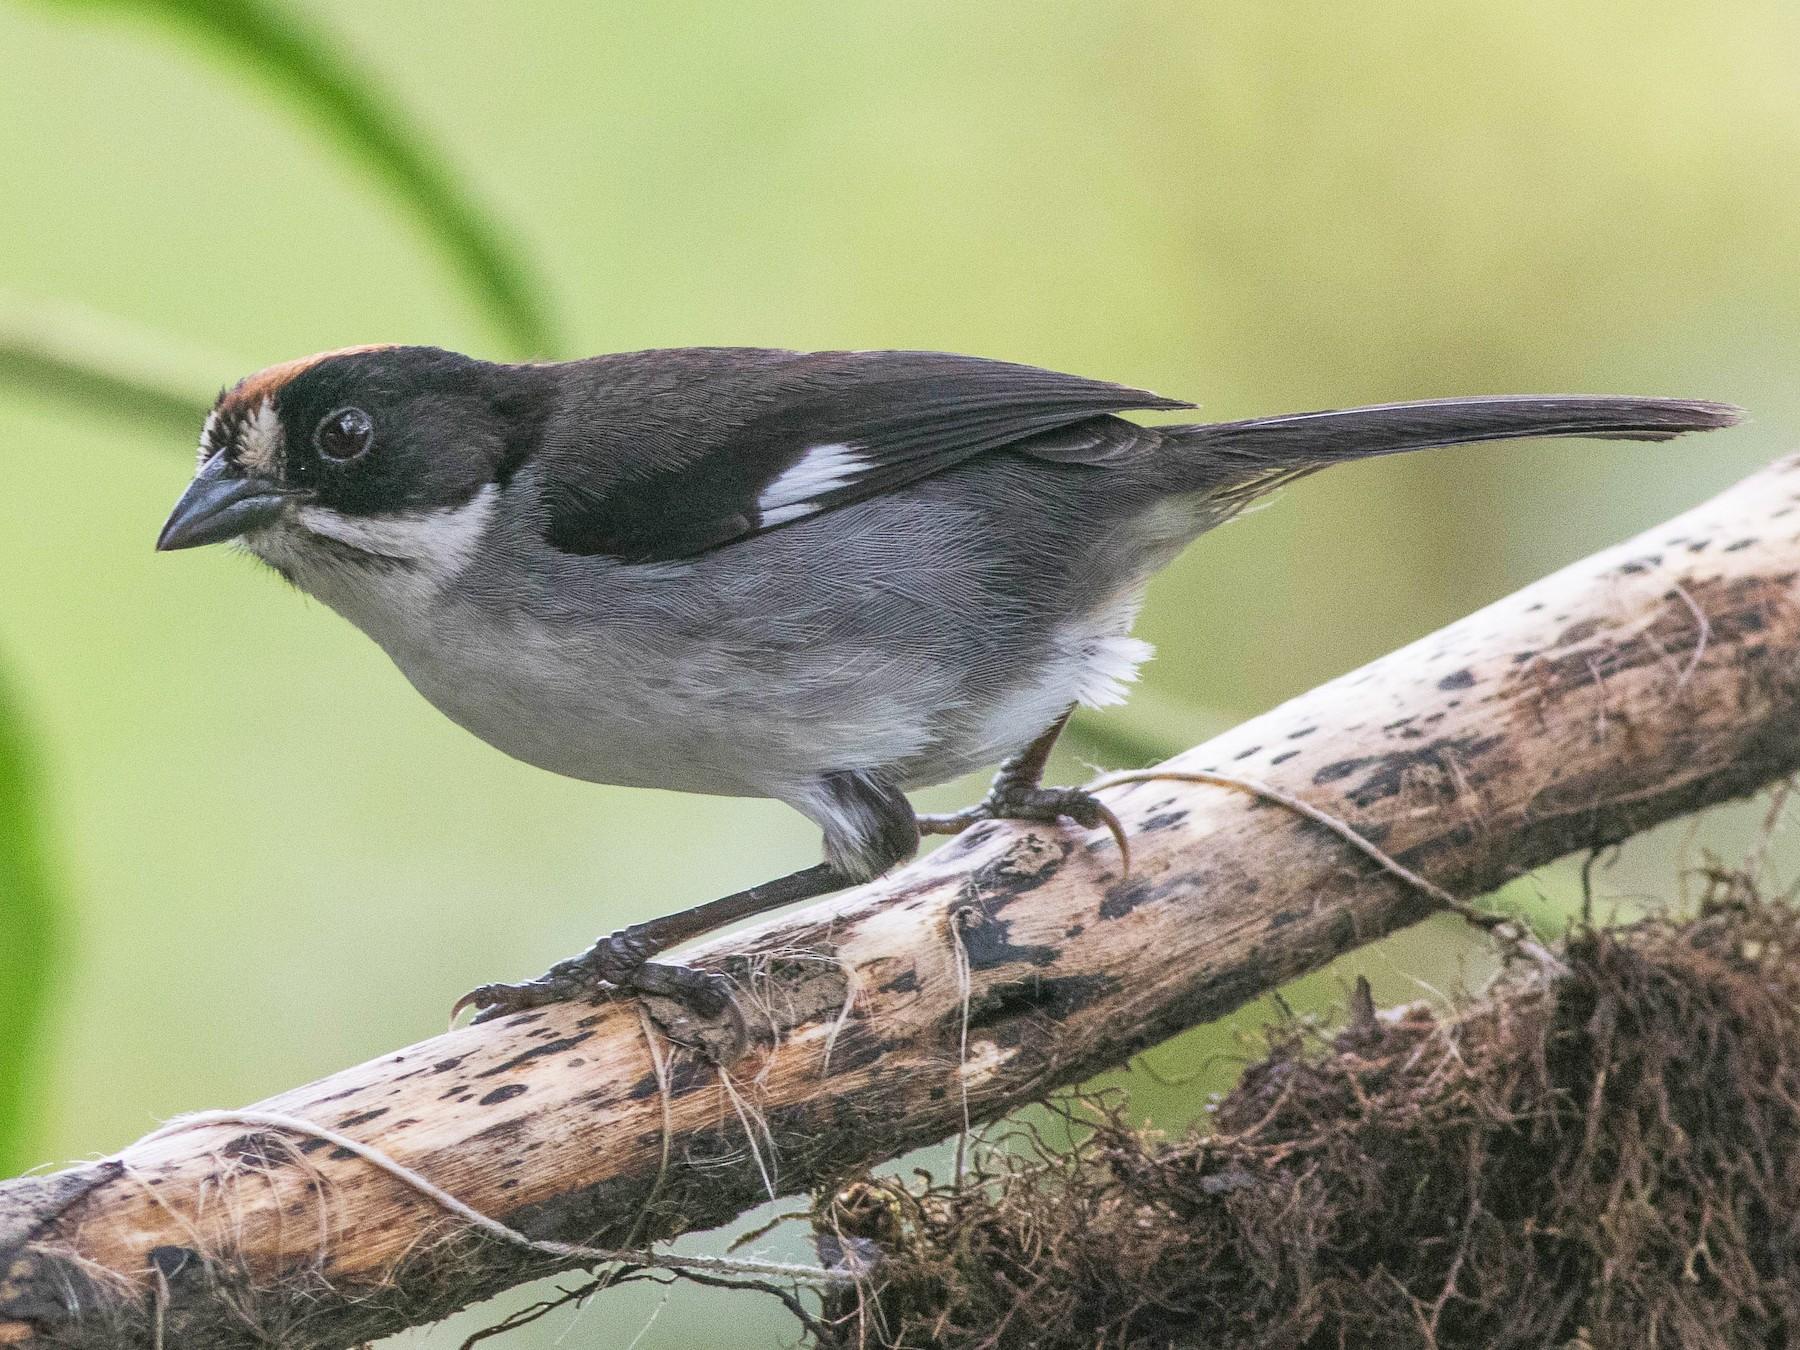 White-winged Brushfinch - Jack Rogers